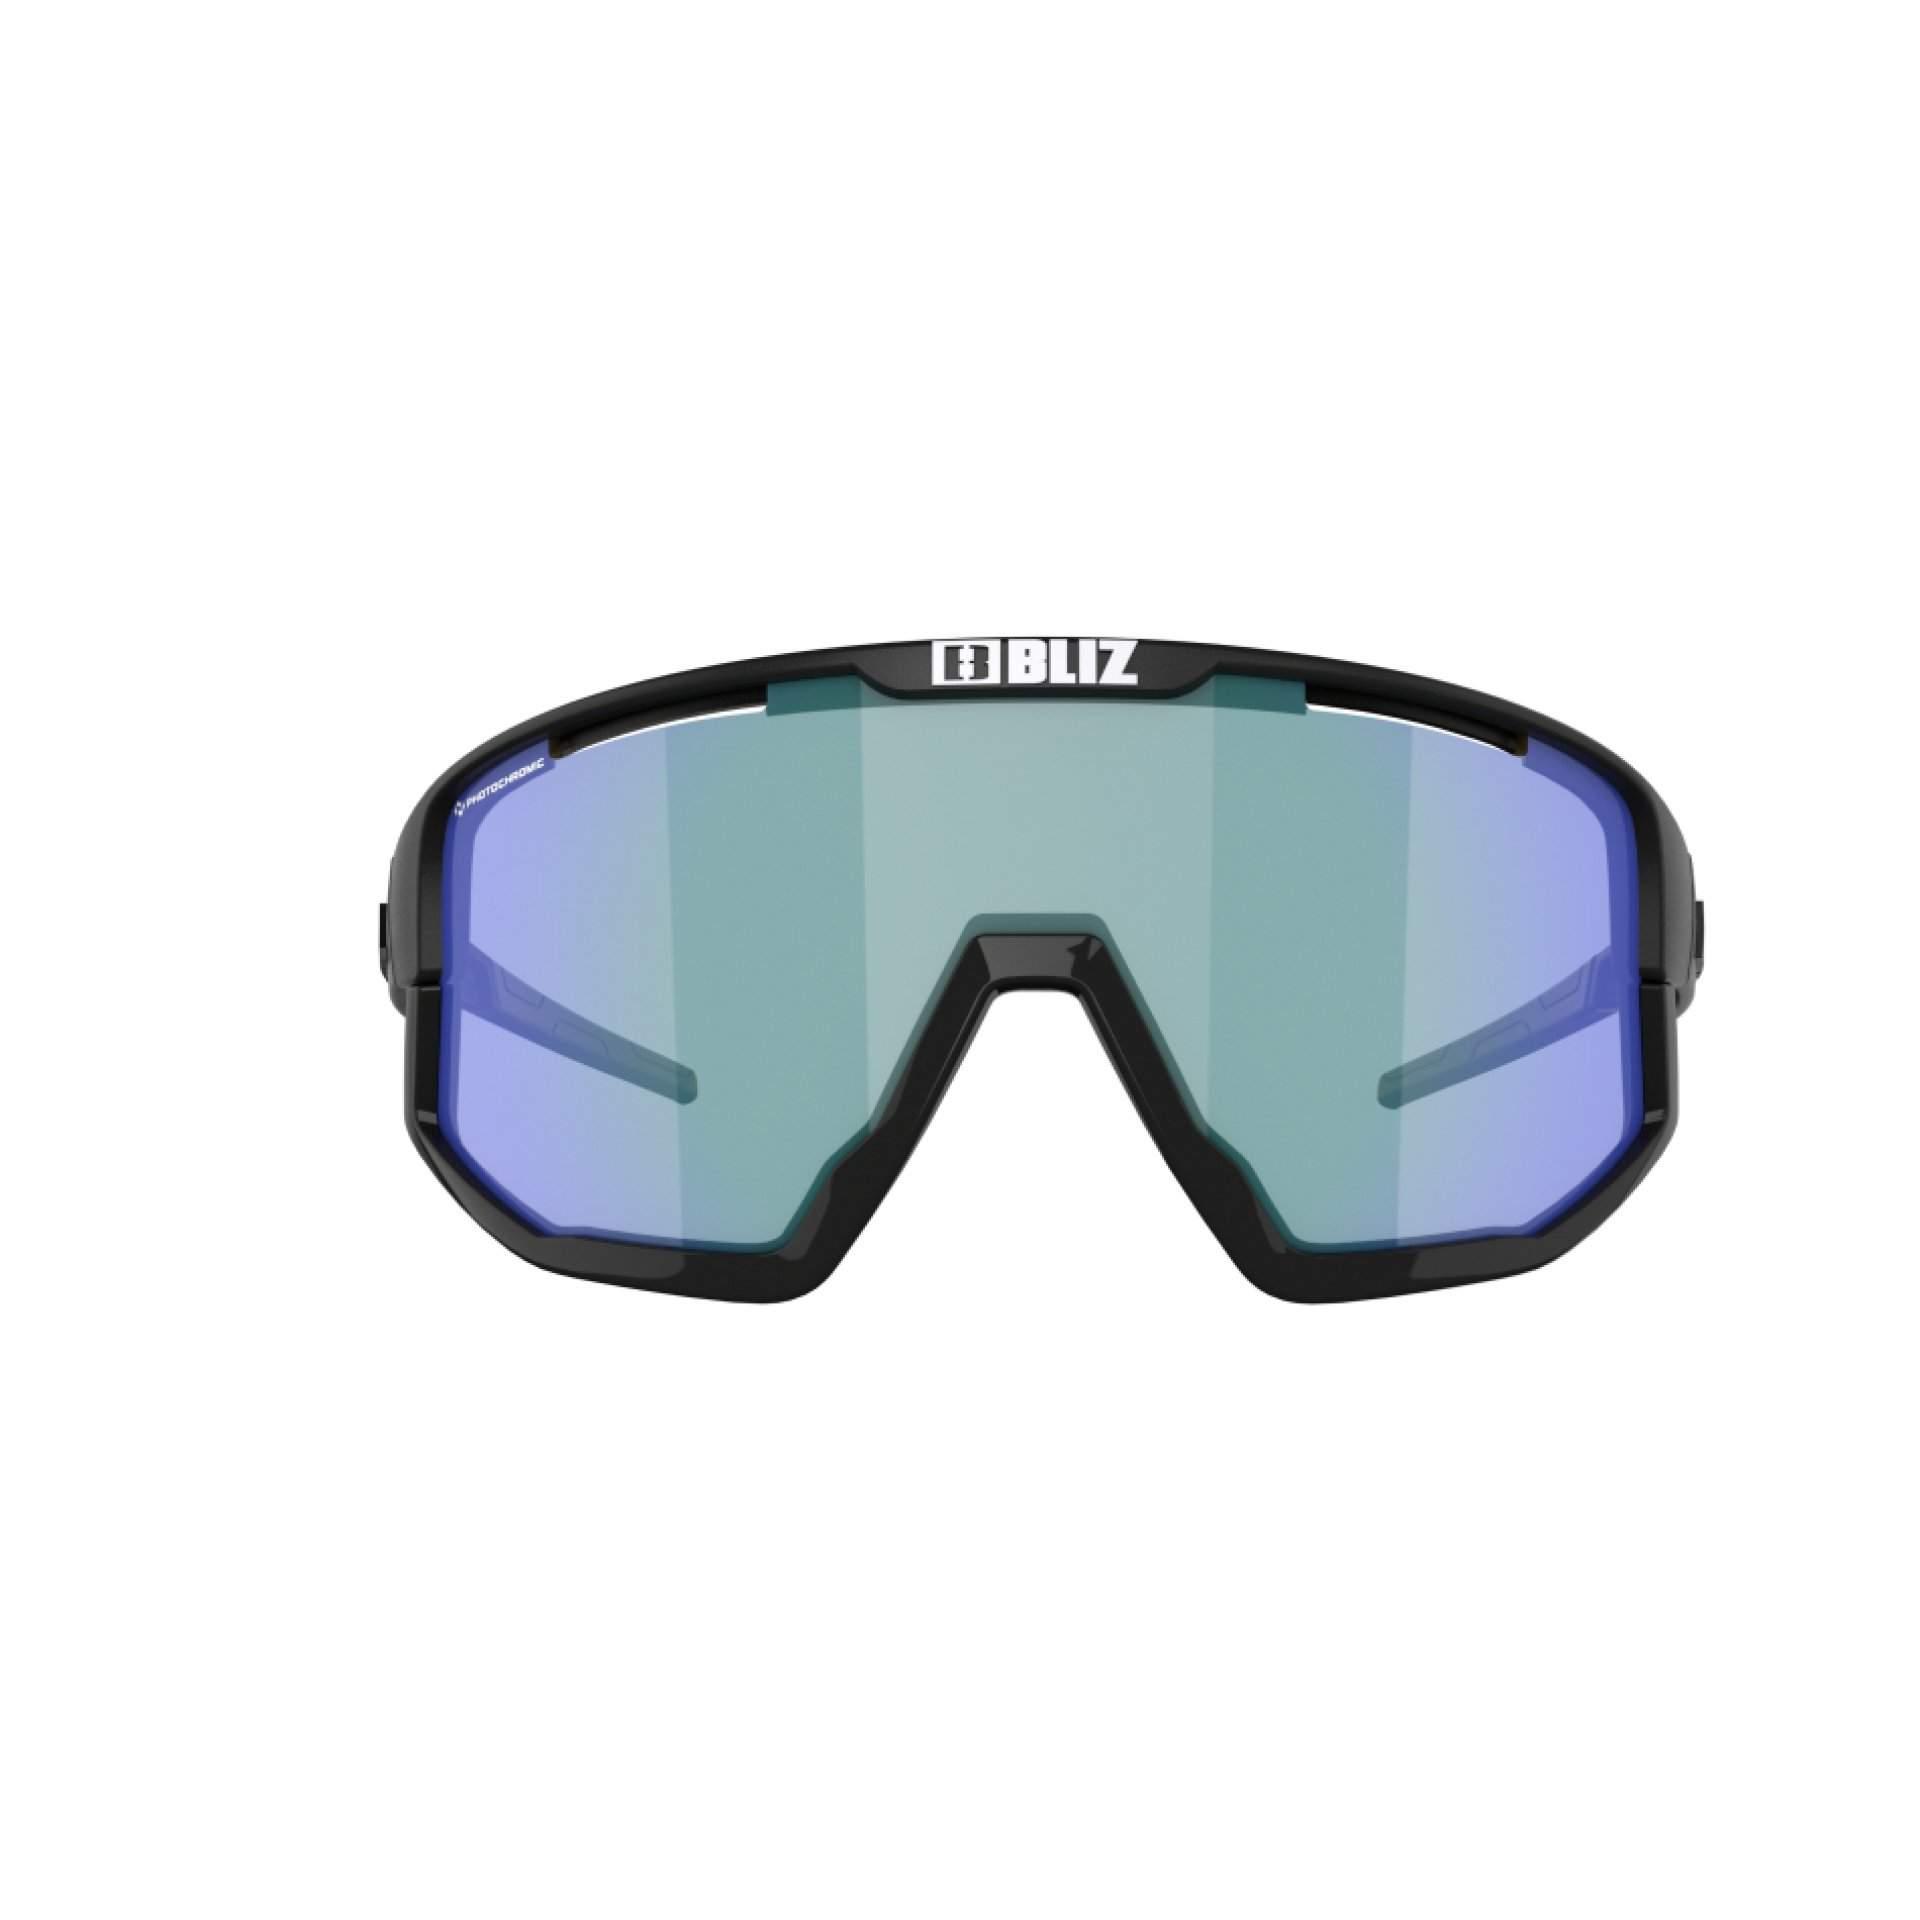 OKULARY BLIZ VISION NANO MATT BLACK|BROWN W BLUE MULTI 52101|13P Z PRZODU